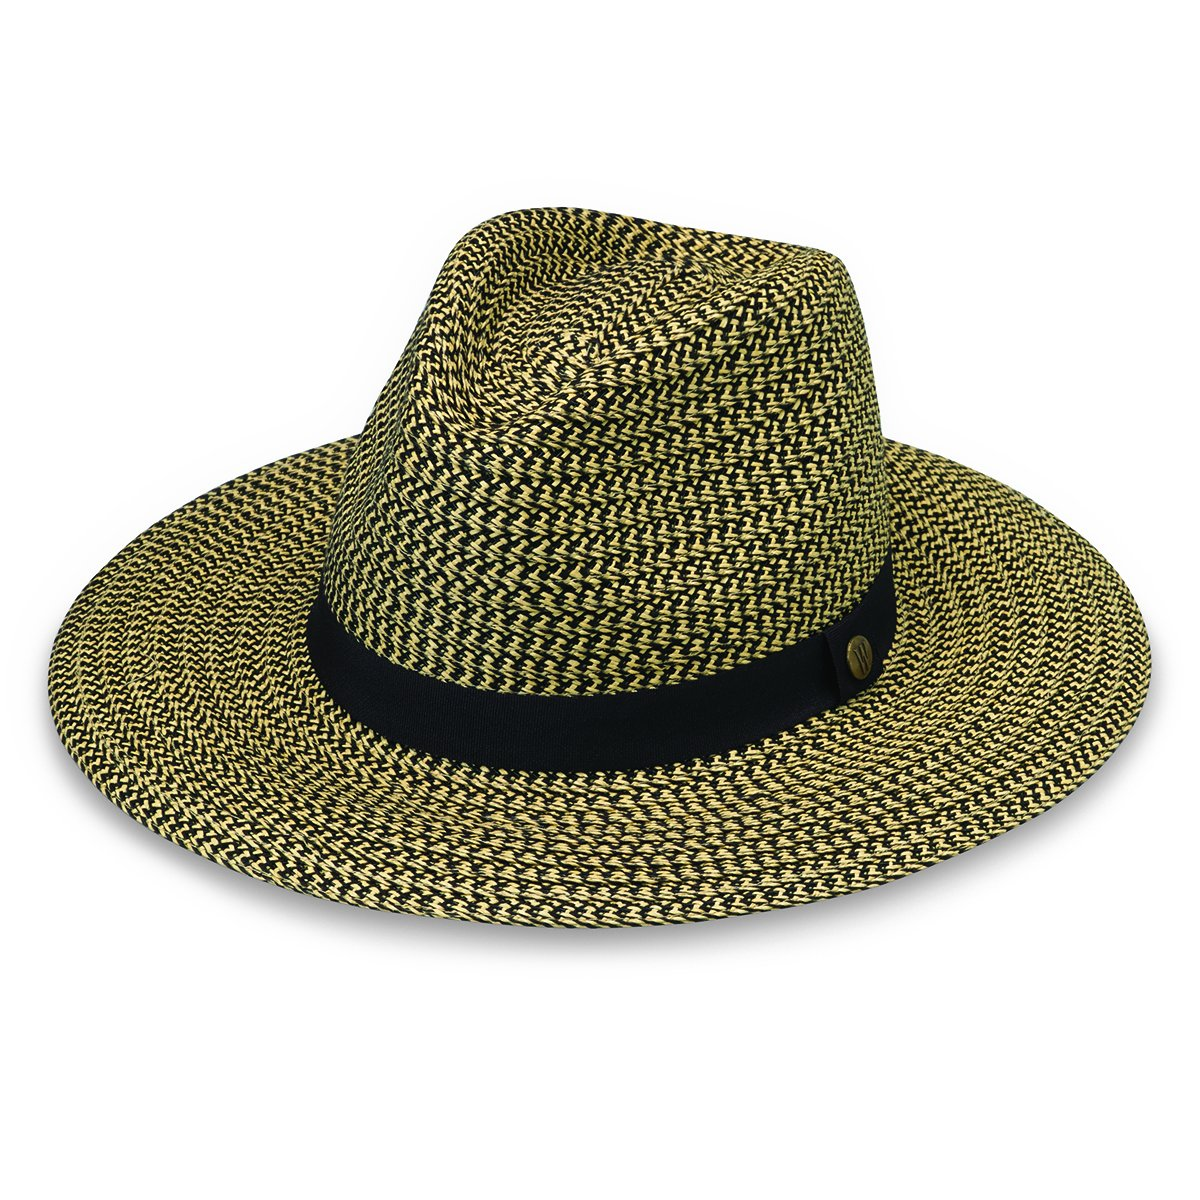 Uomo Wallaroo Cappello Fedora